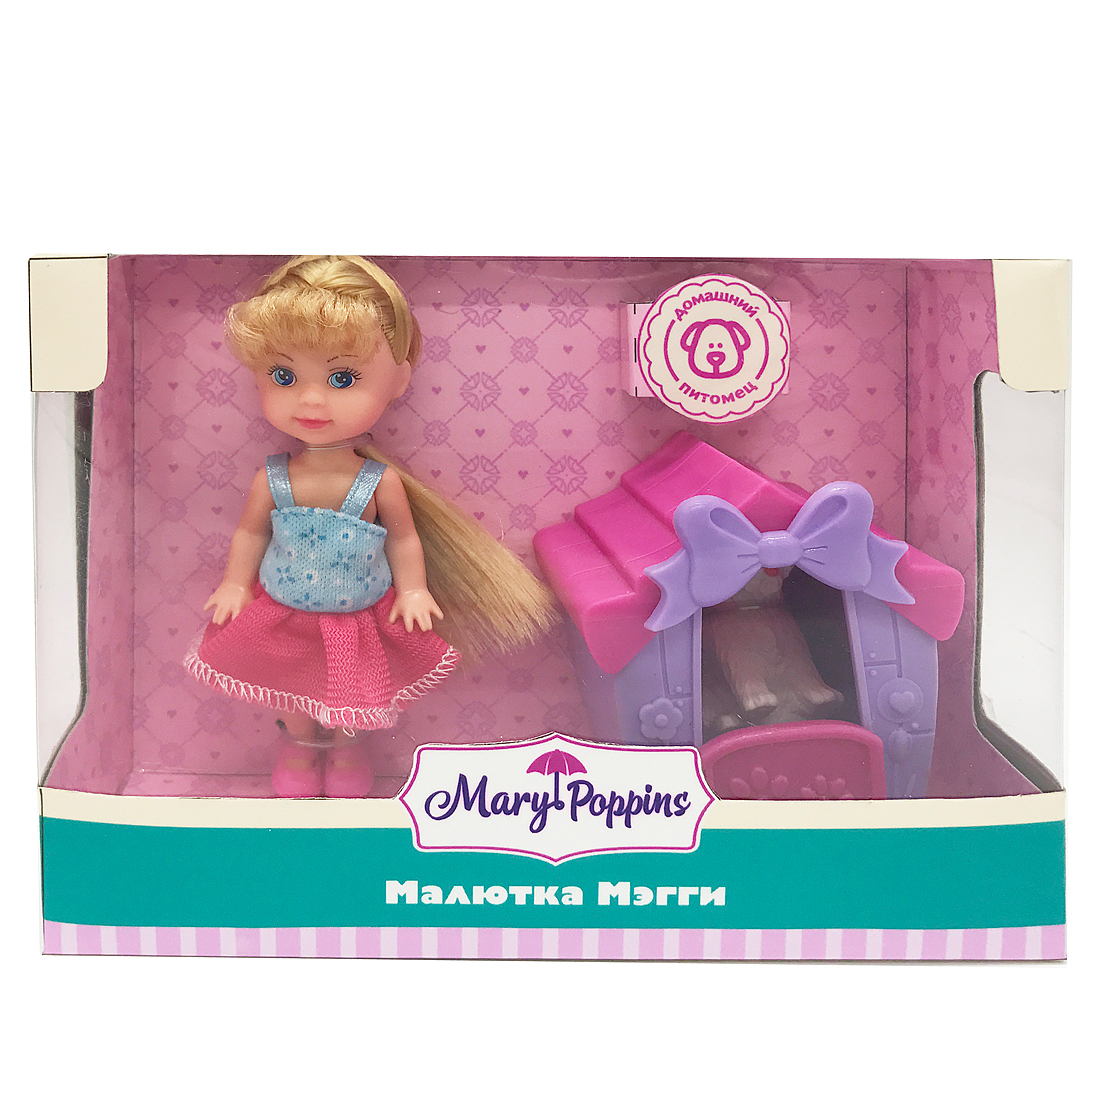 Другие куклы Mary Poppins Малютка Мэгги: Дом для питомца все цены